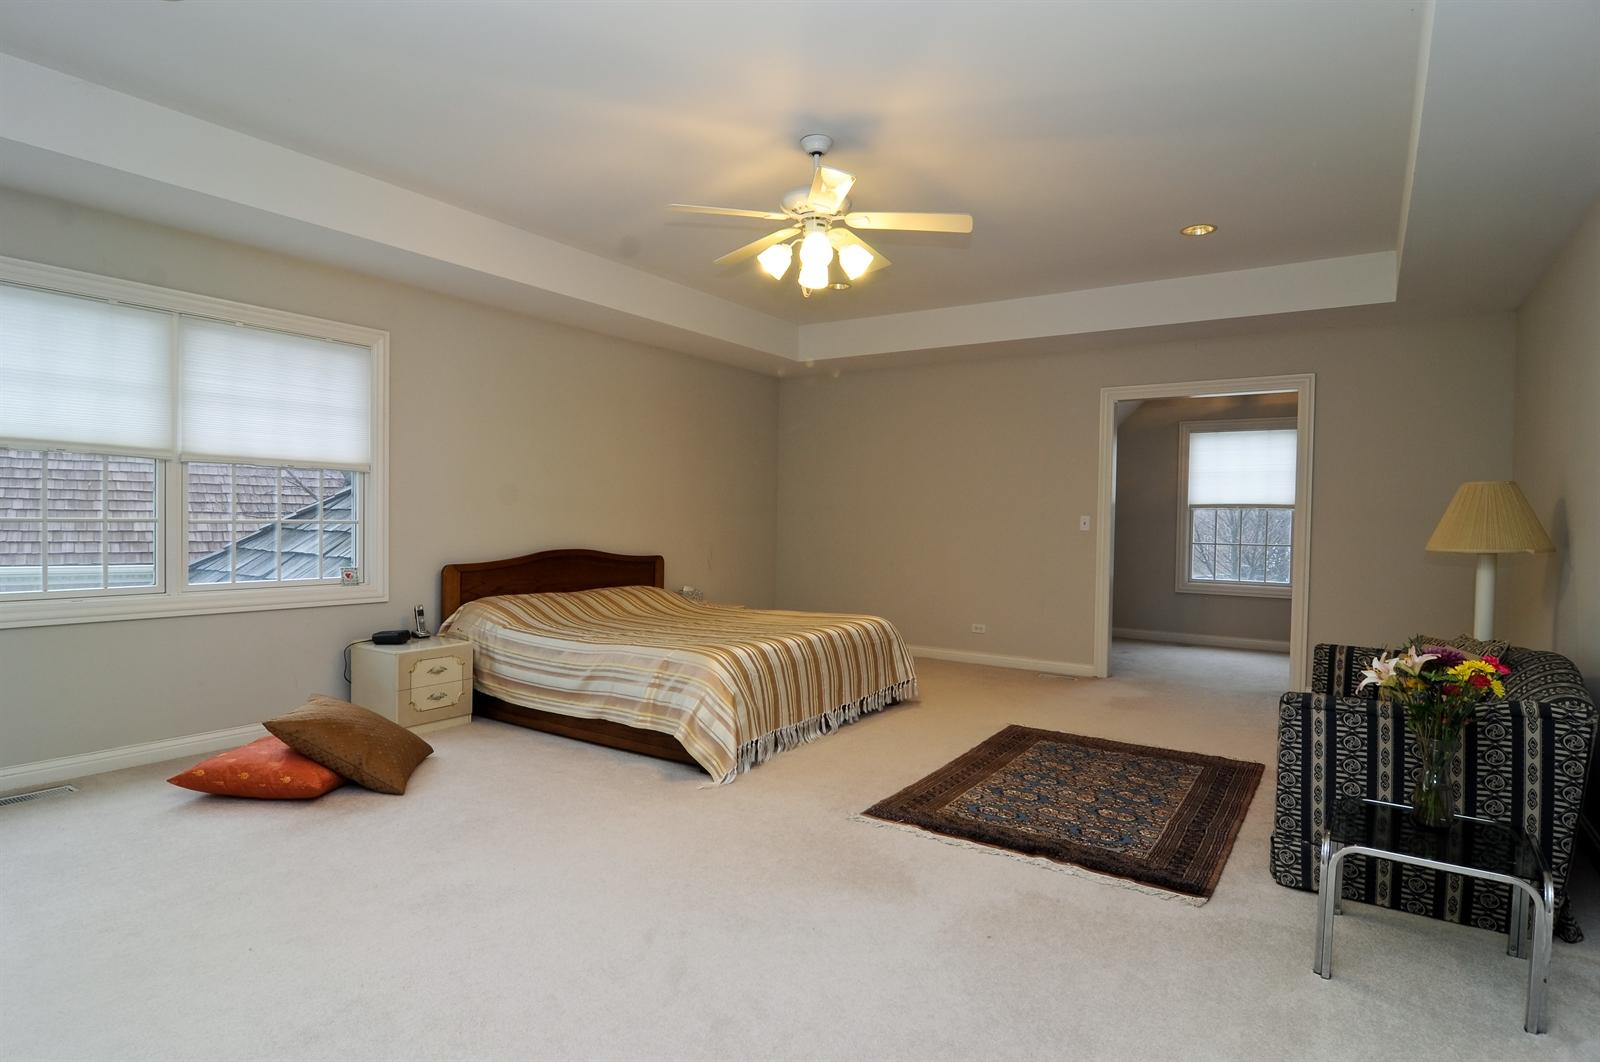 Real Estate Photography - 1020 Oakland, Barrington, IL, 60010 - Master Bedroom